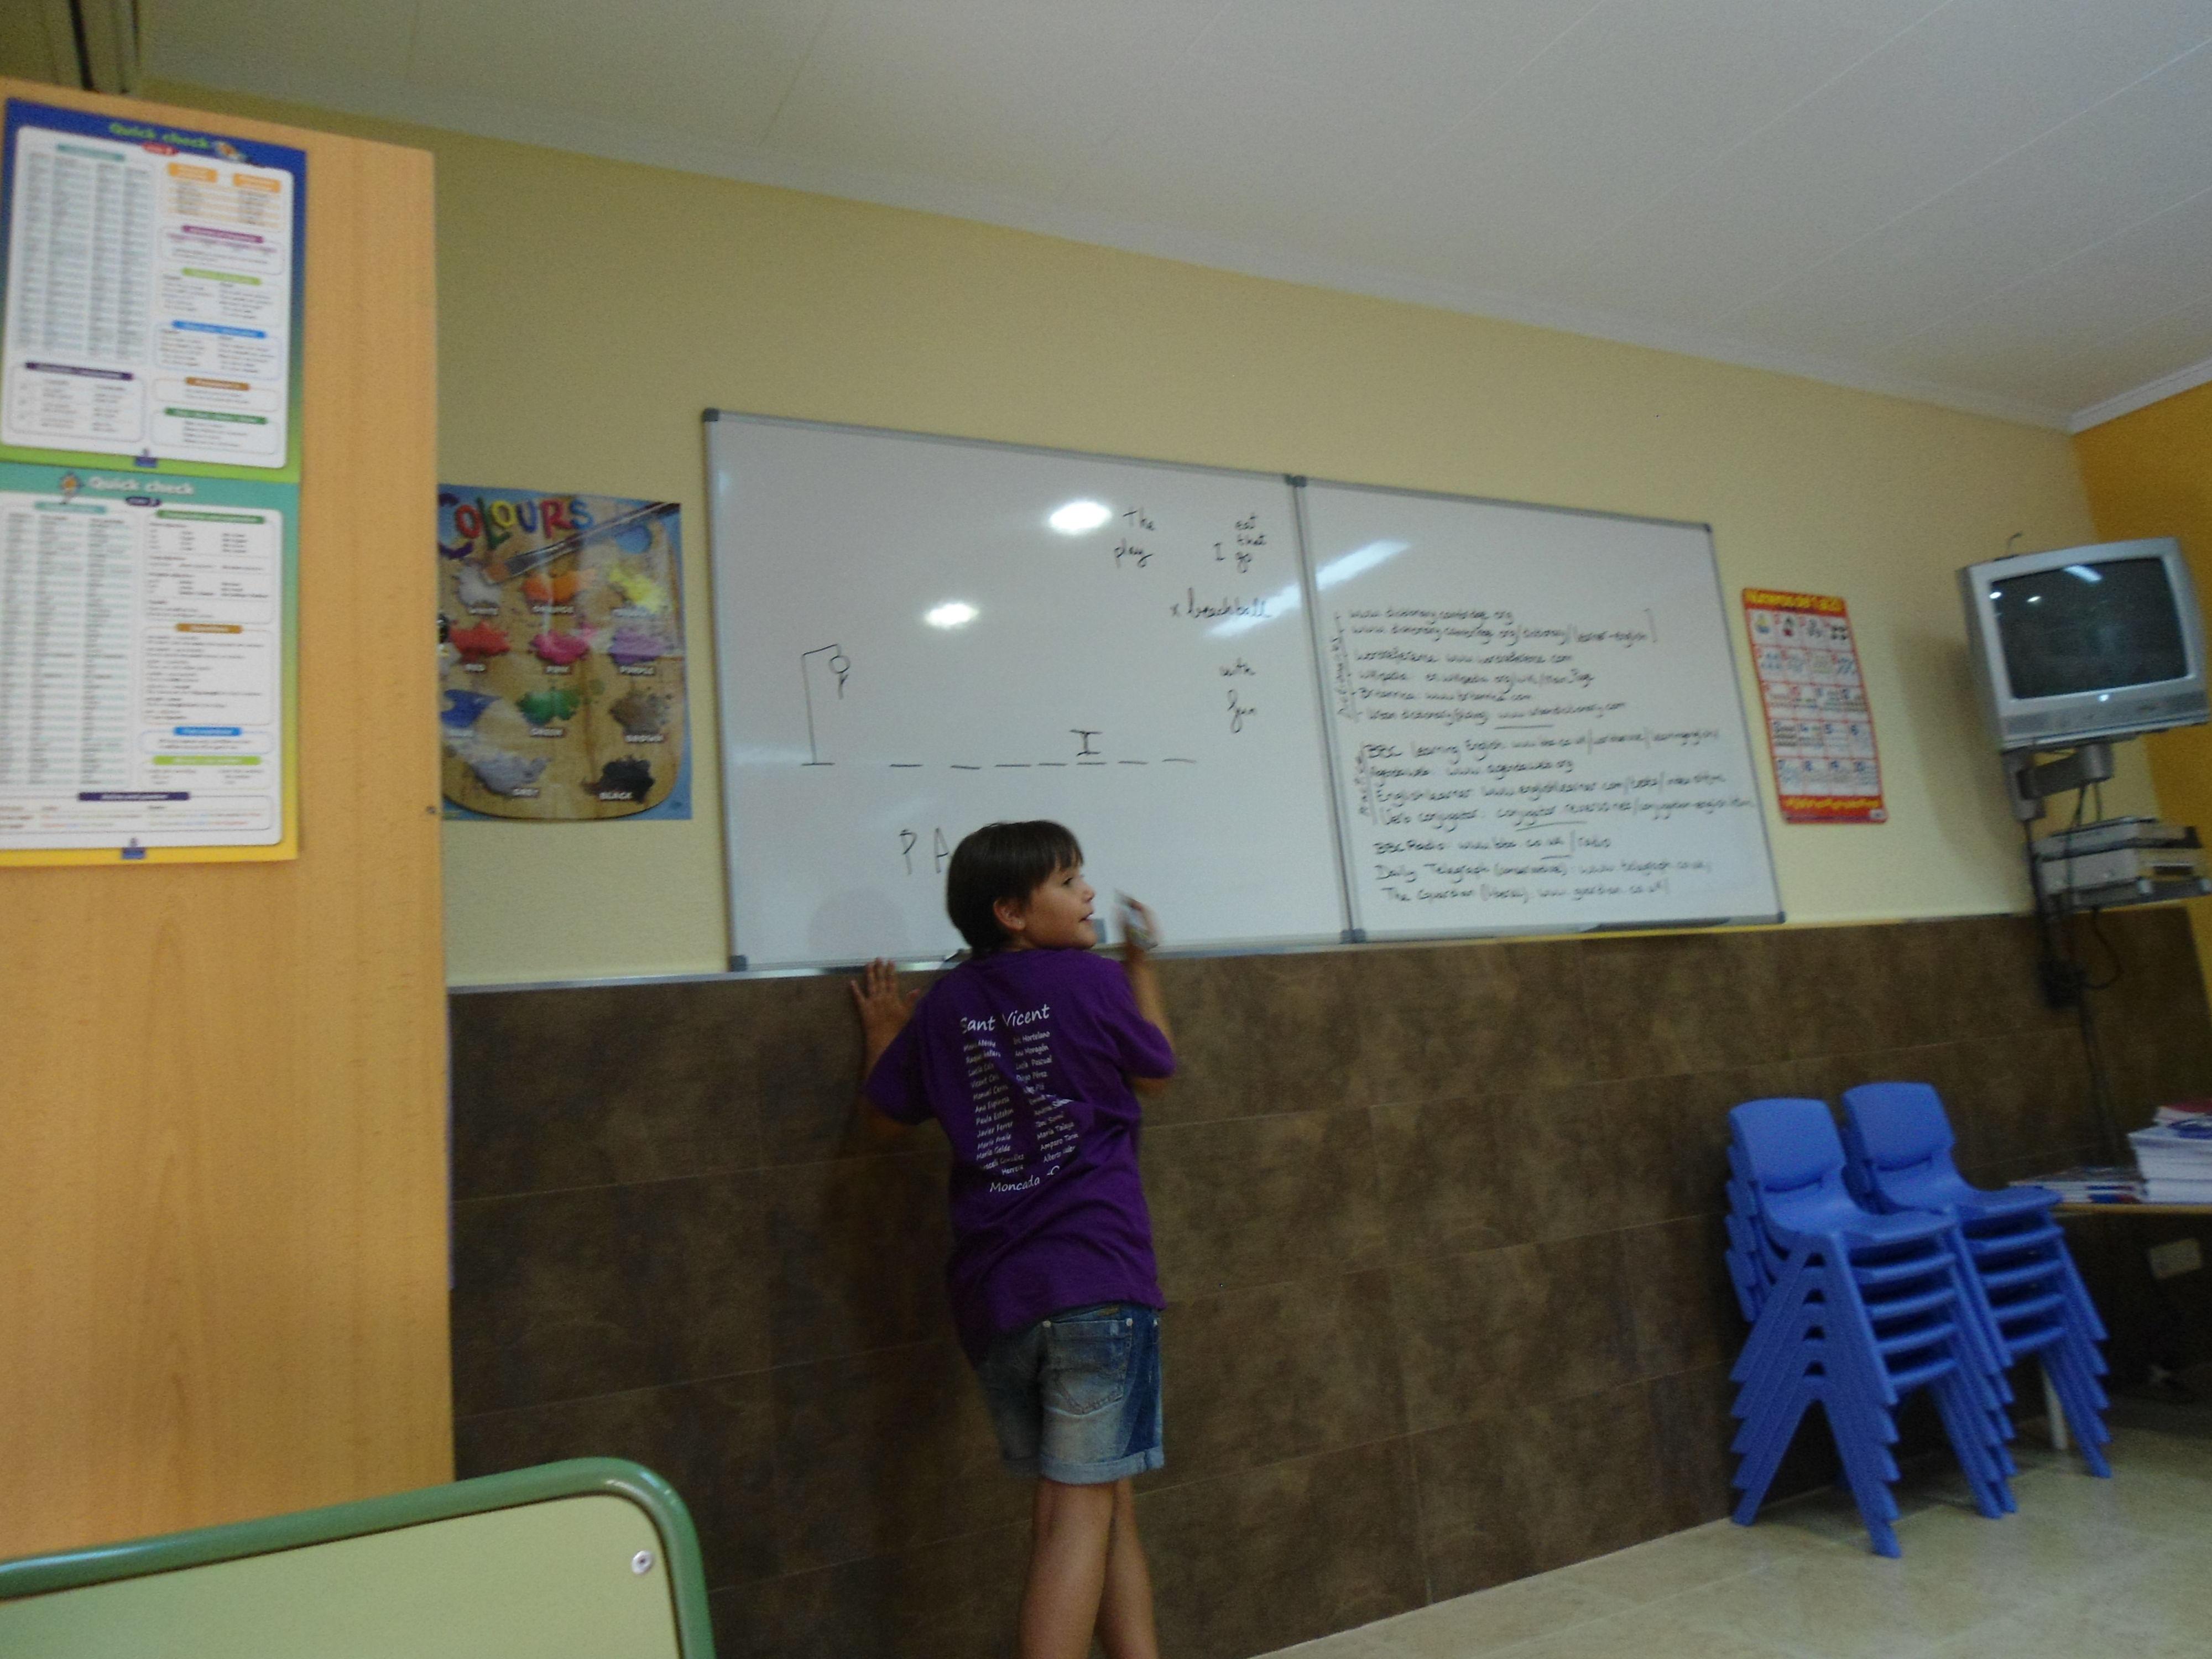 Foto 28 de Academias de idiomas en Moncada | Centre d'Estudis Etnies